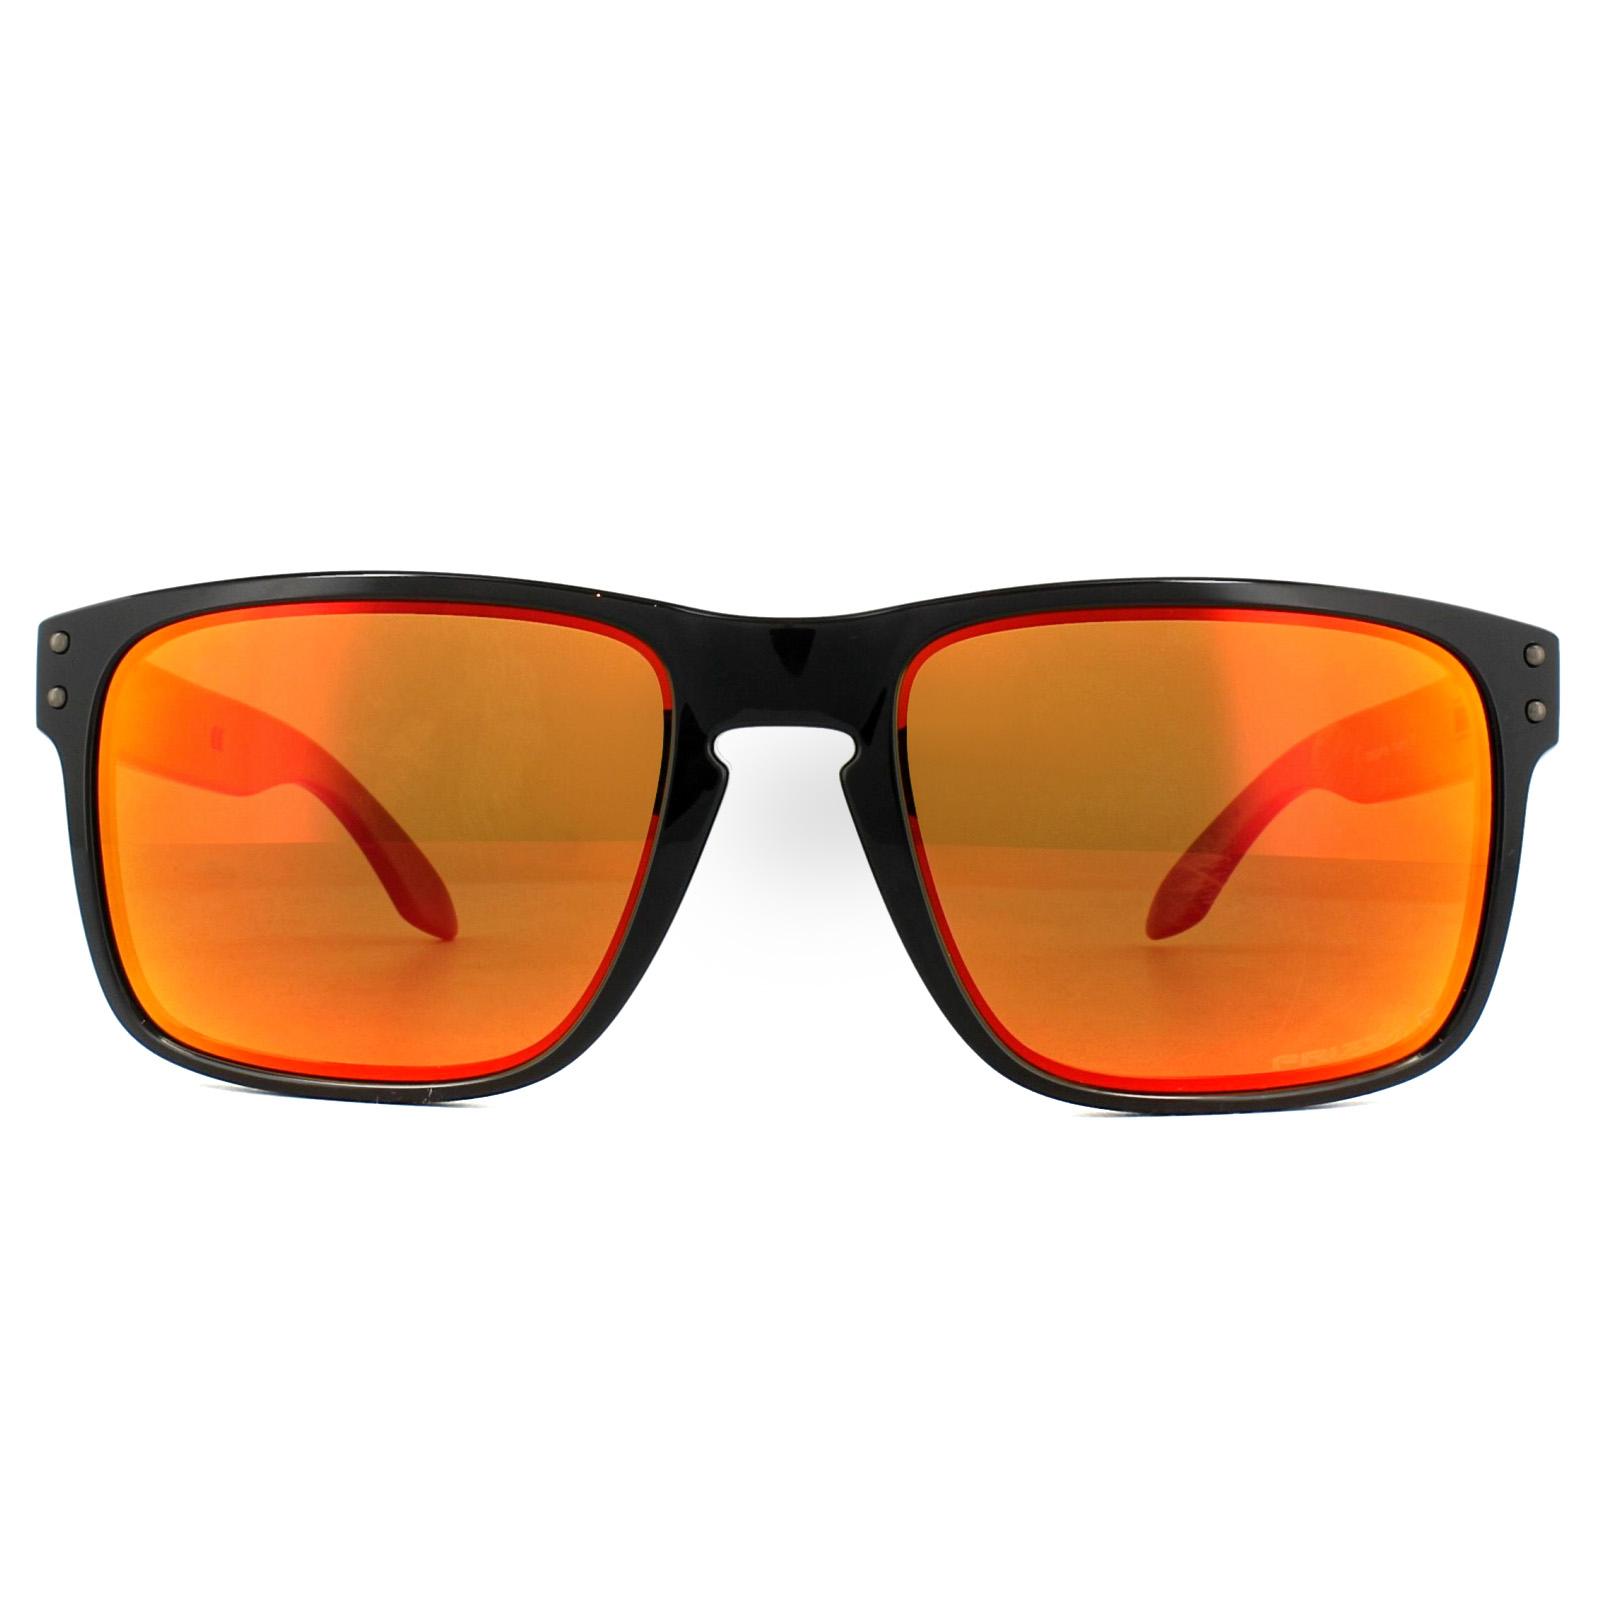 9b63c9dc5f Sentinel Oakley Sunglasses Holbrook OO9102-F1 Polished Black Prizm Ruby  Polarized